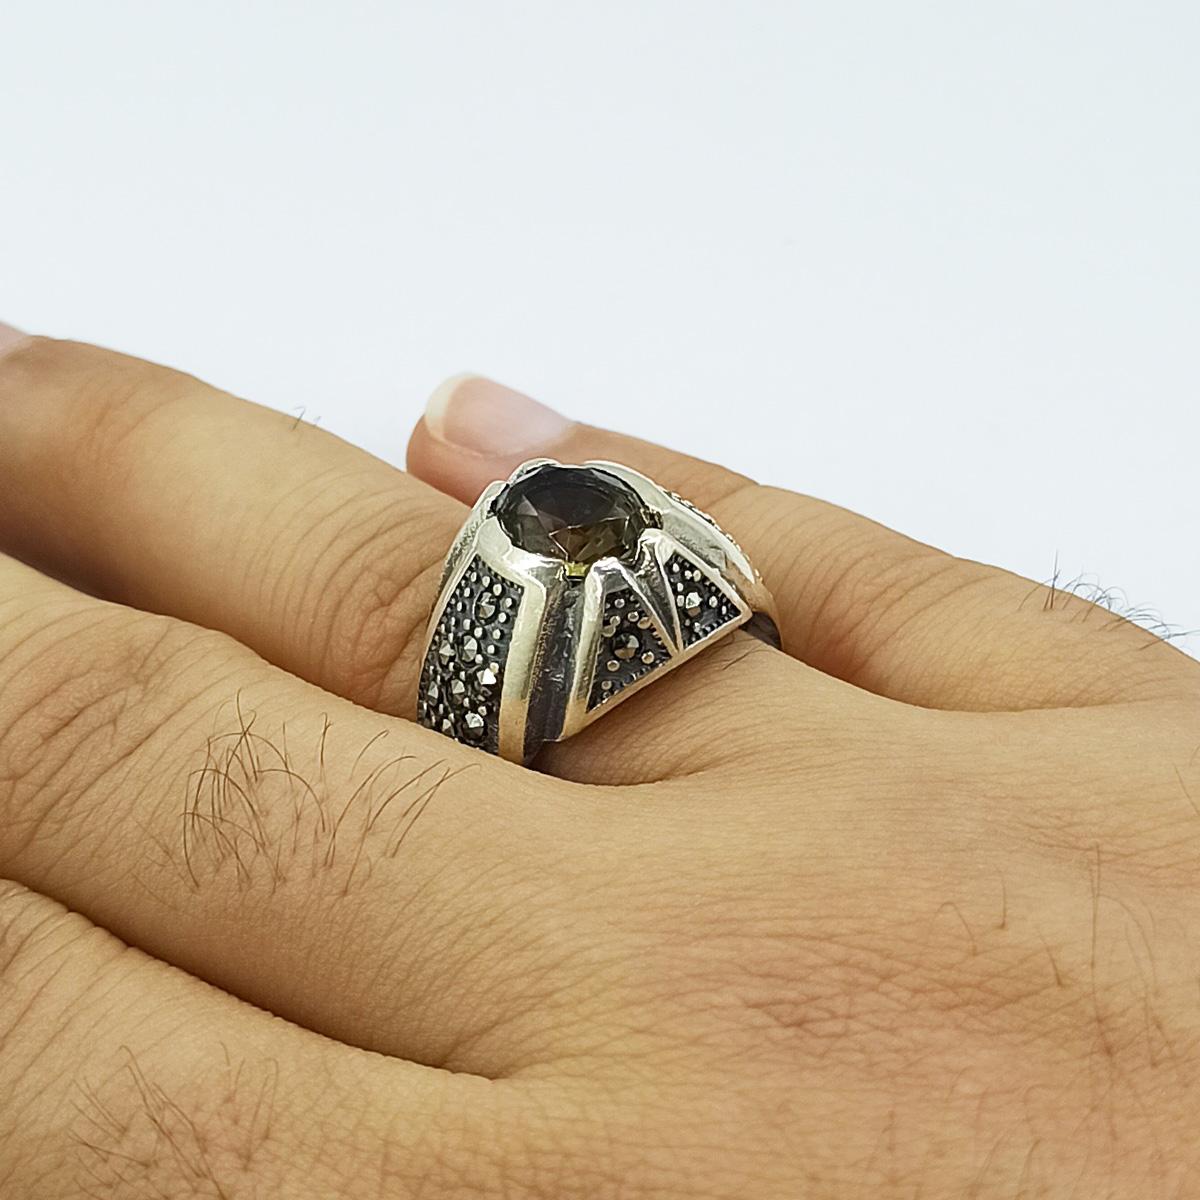 انگشتر نقره مردانه سلین کالا مدل الکساندریت کد ce-As120